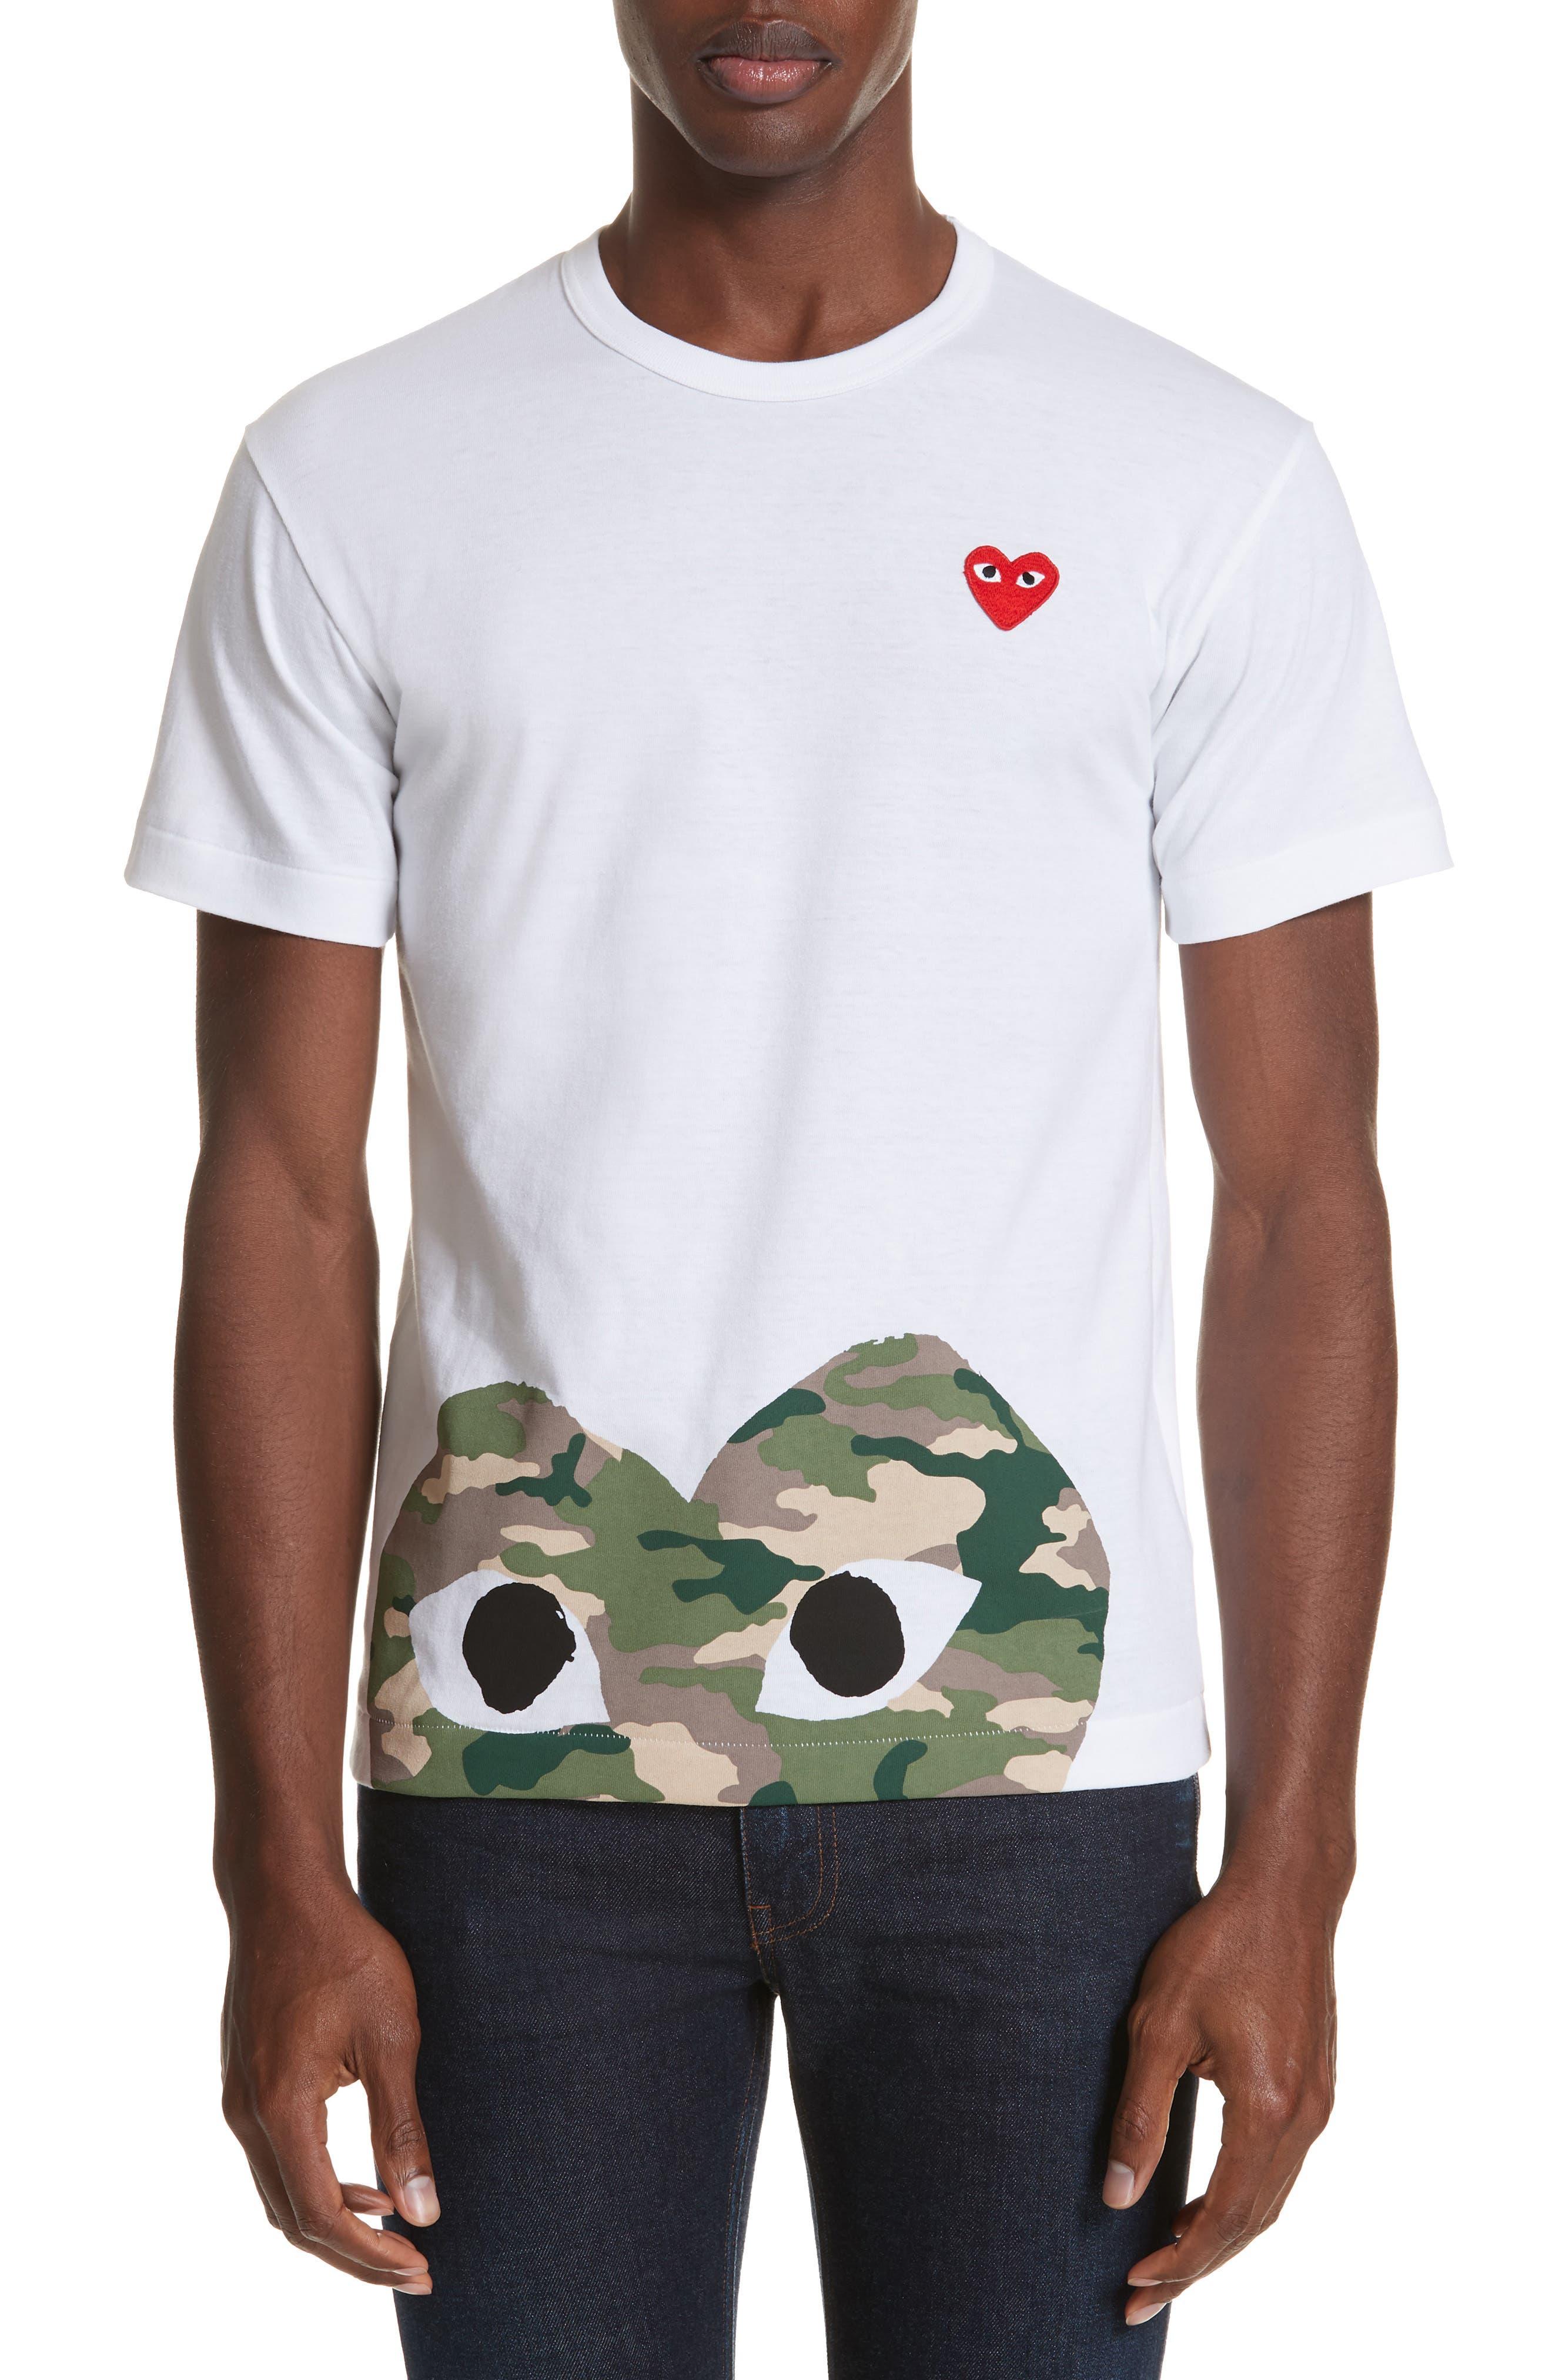 cdg shirt for sale